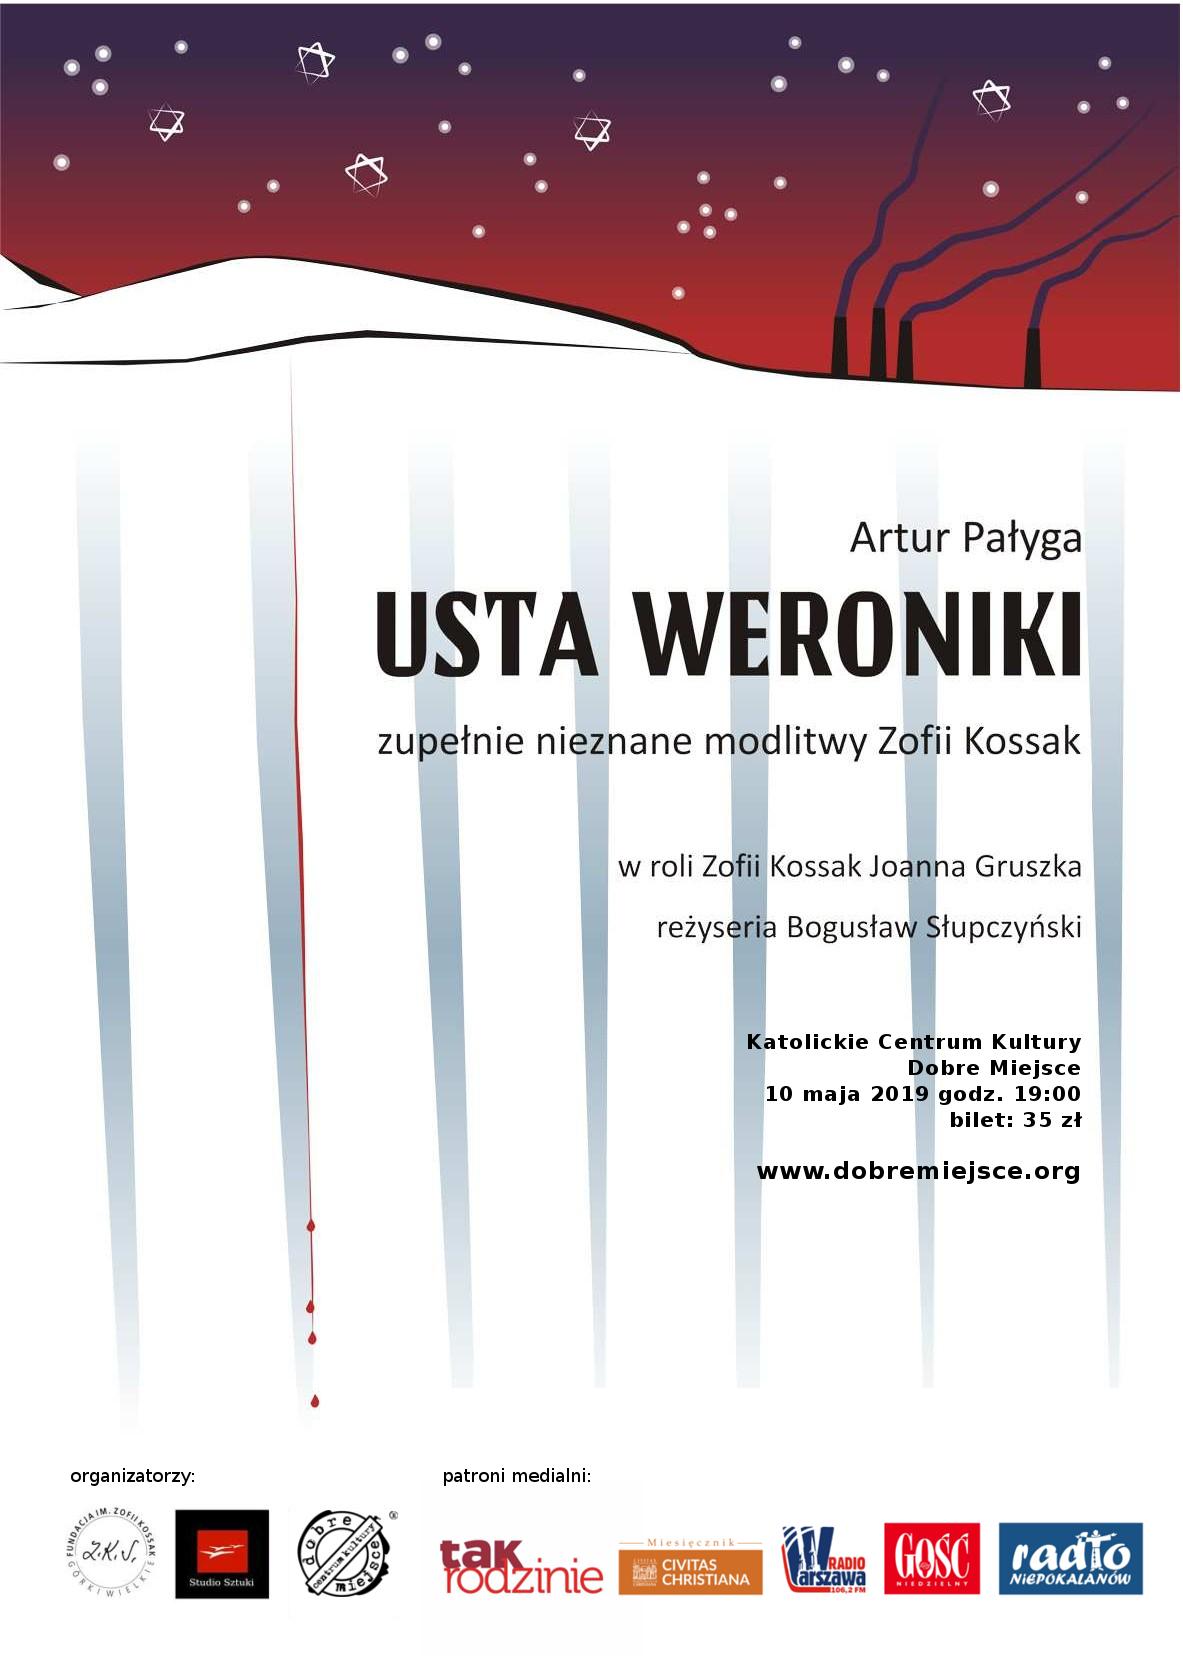 UstaWeroniki-plakat3